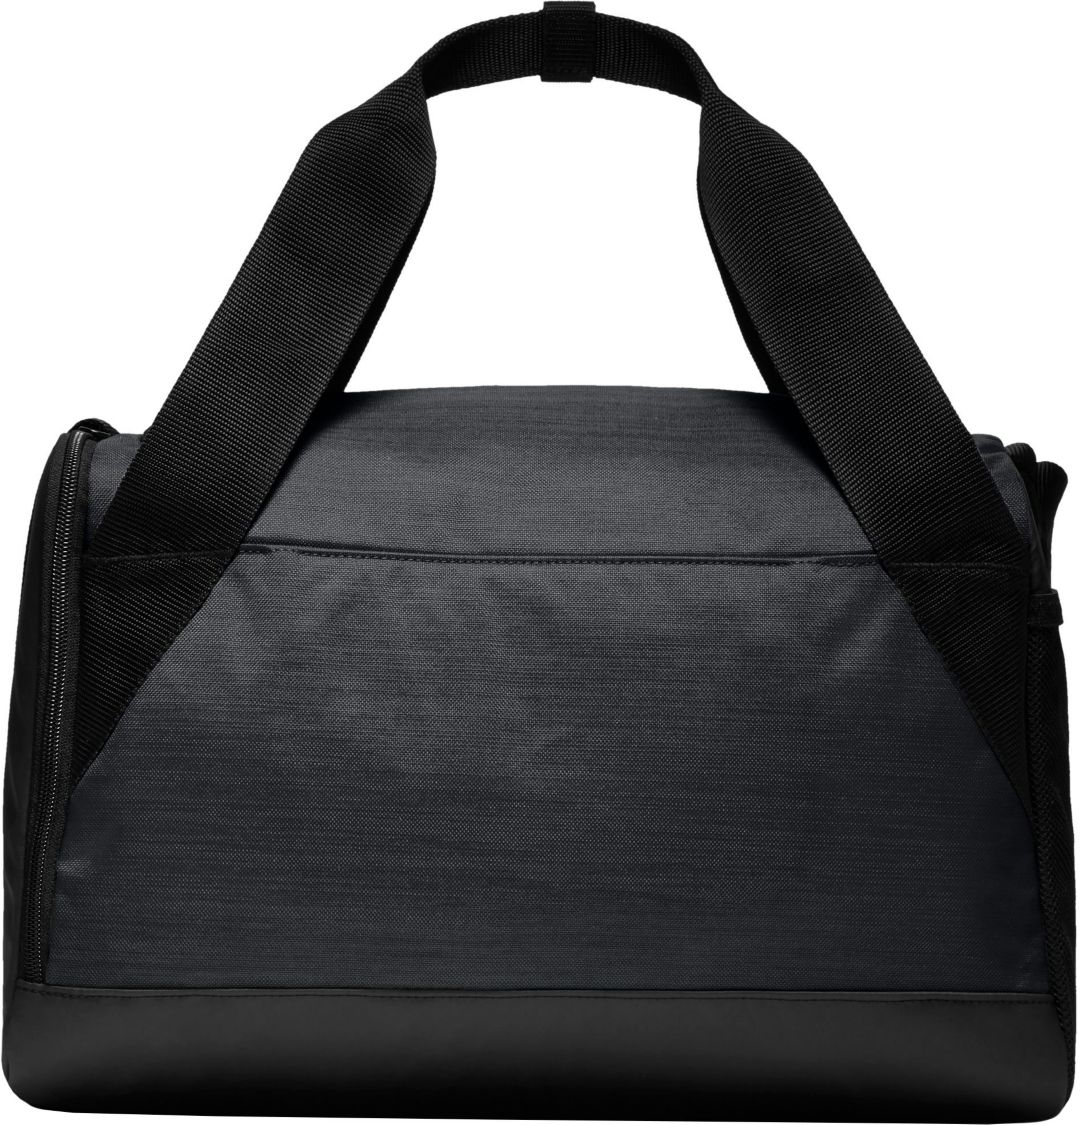 Nike Brasilia Extra Small Training Duffle Bag